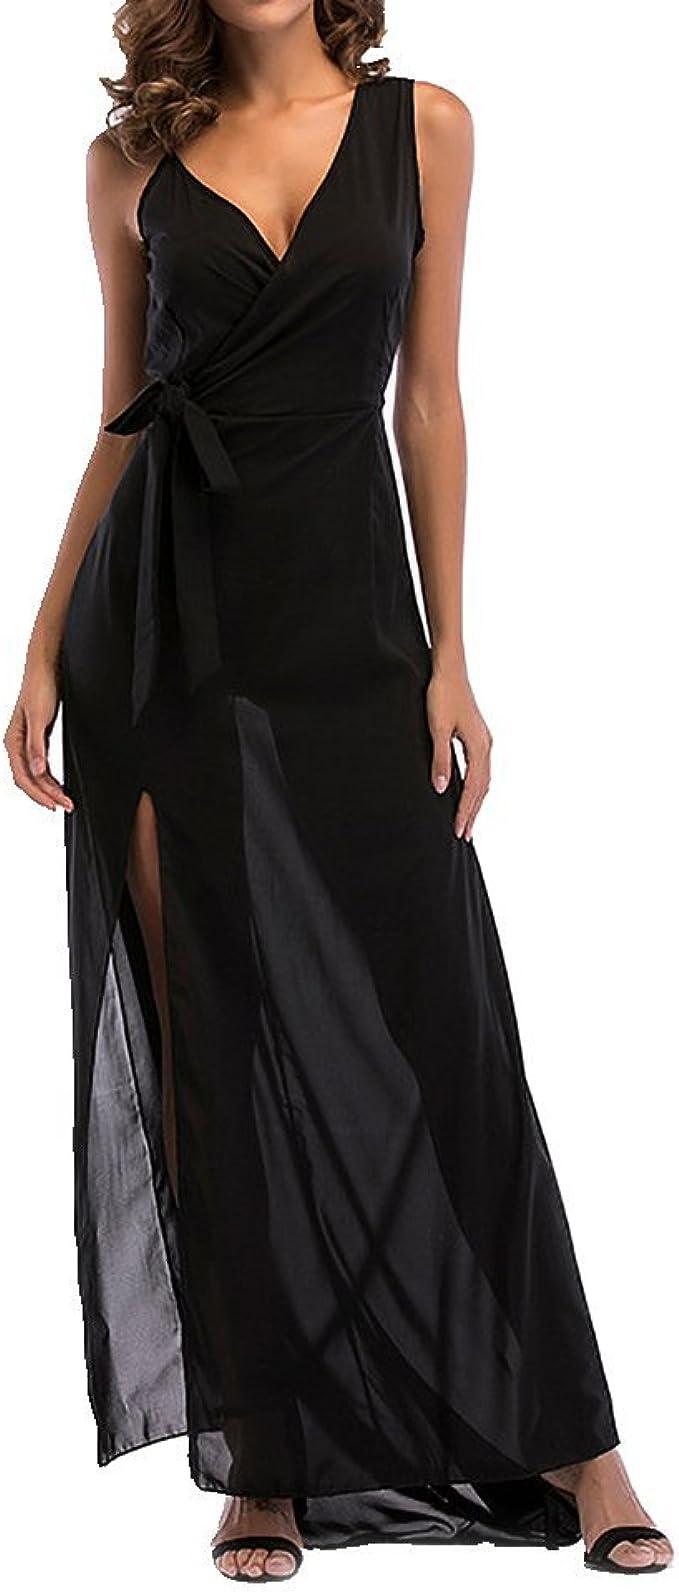 Blansdi Damen Ärmellos V-Ausschnitt Träger Kleid Lang